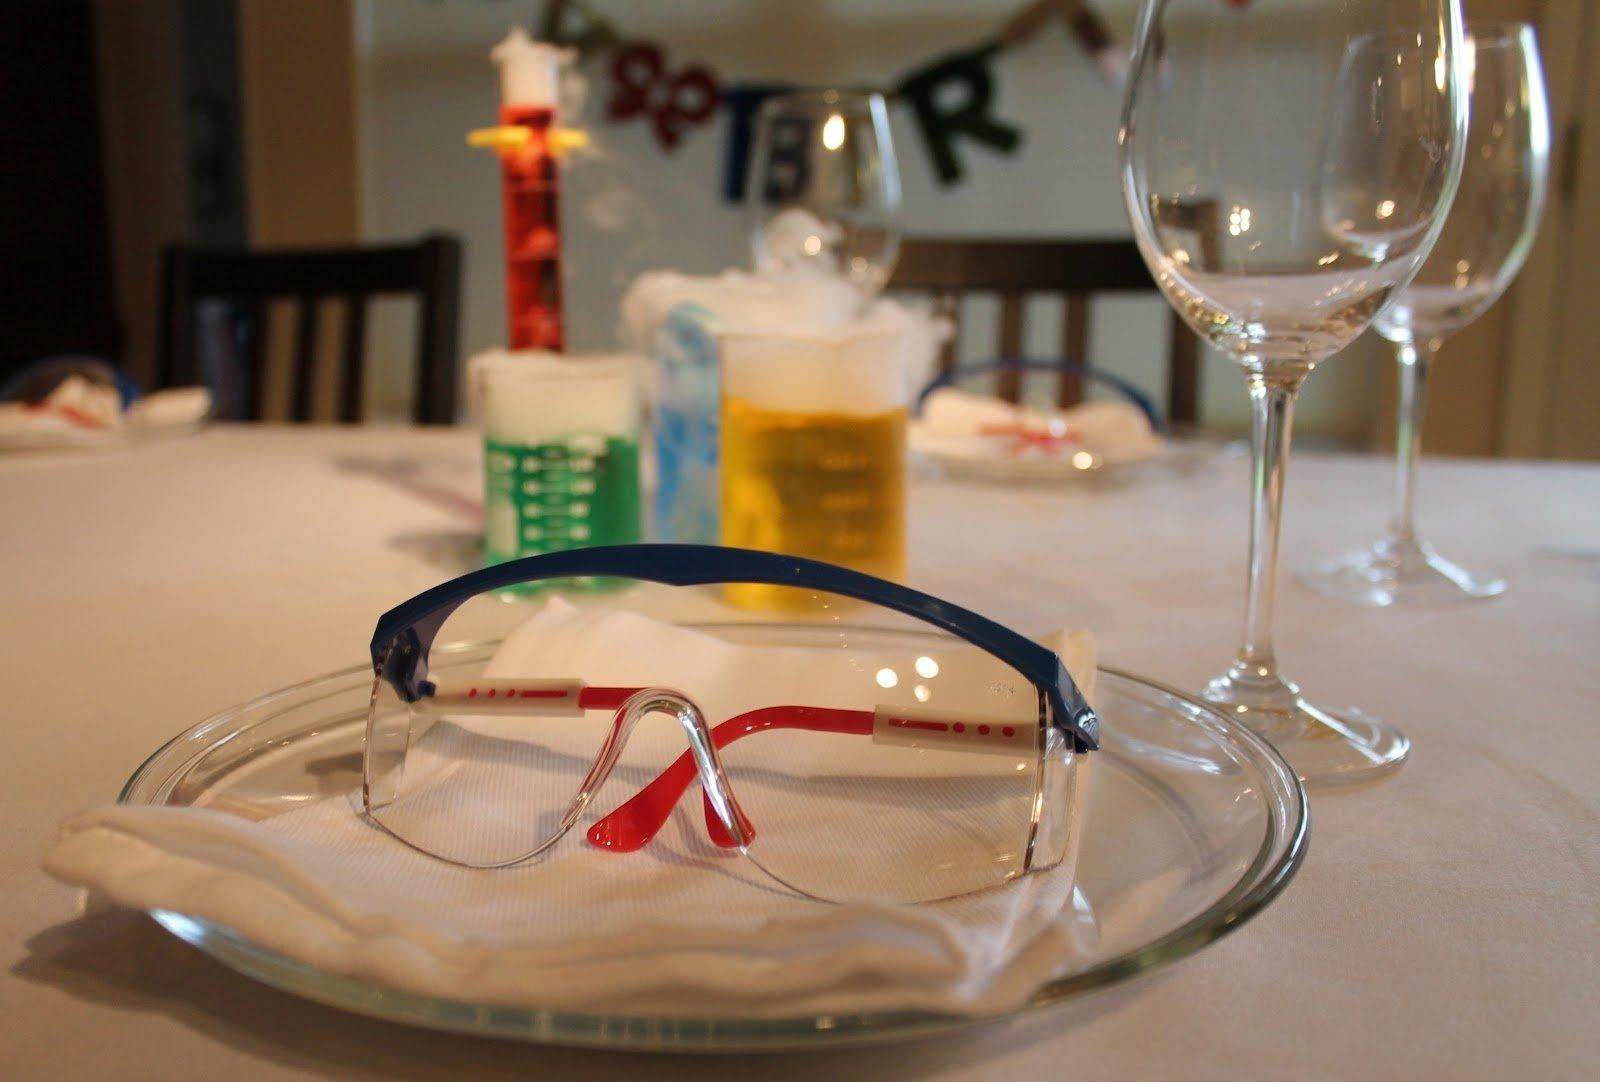 10 Stunning Birthday Party Ideas For Boyfriend arielle clementine planning a molecular gastronomy birthday party